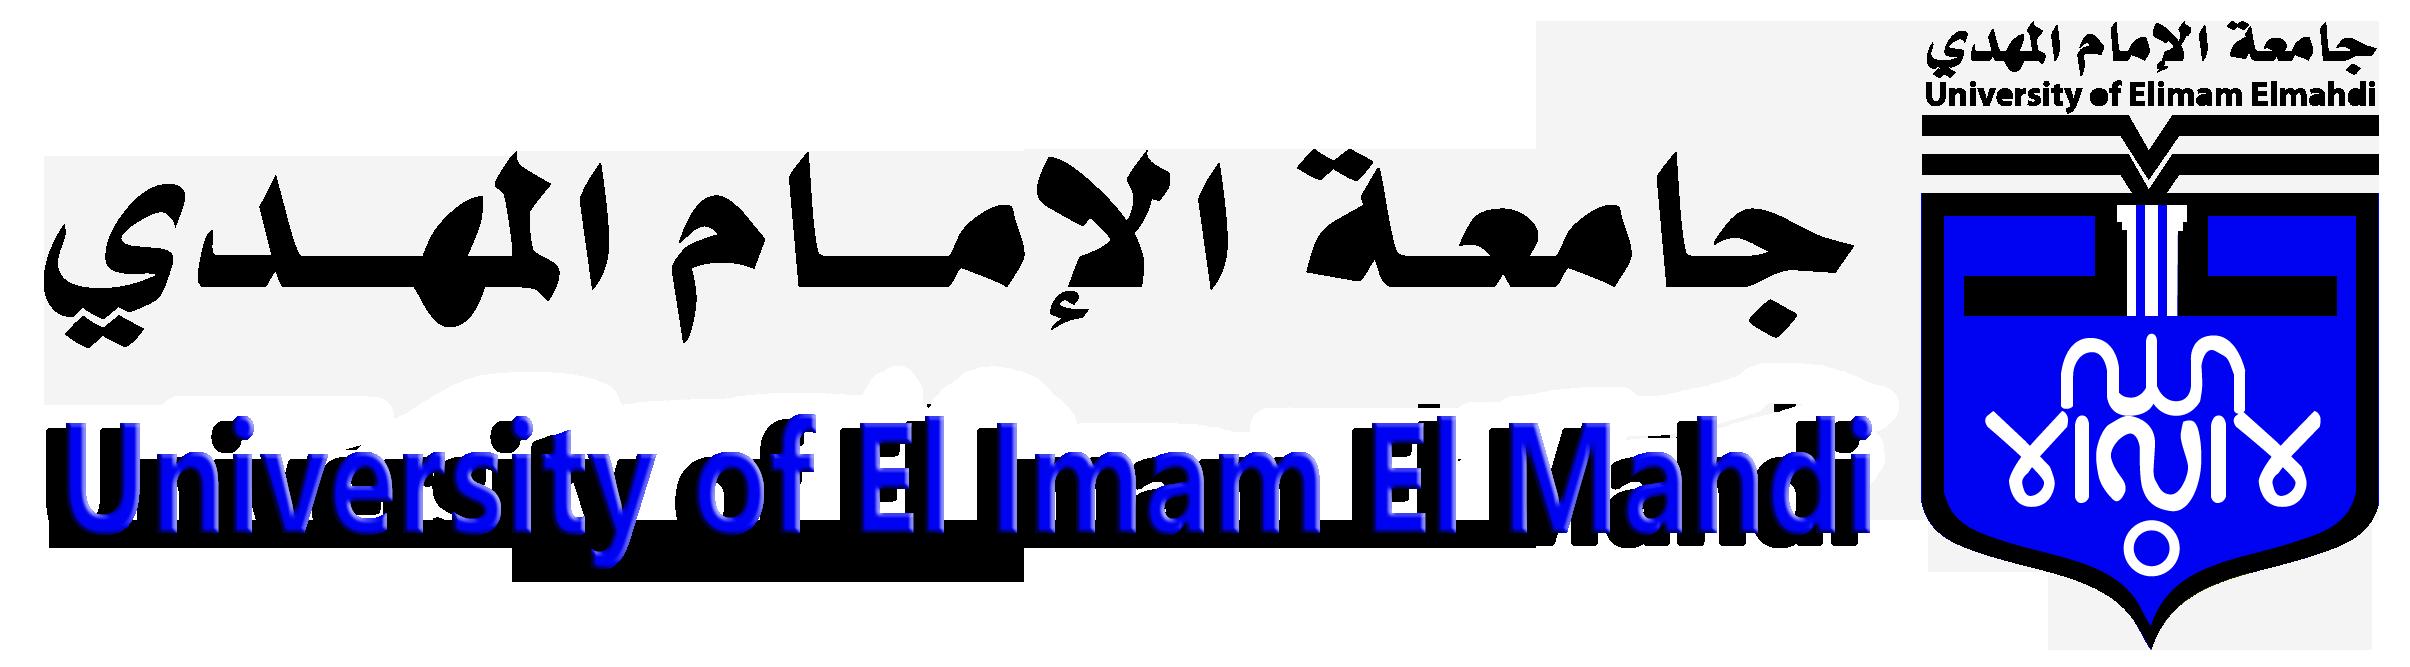 site.siteName